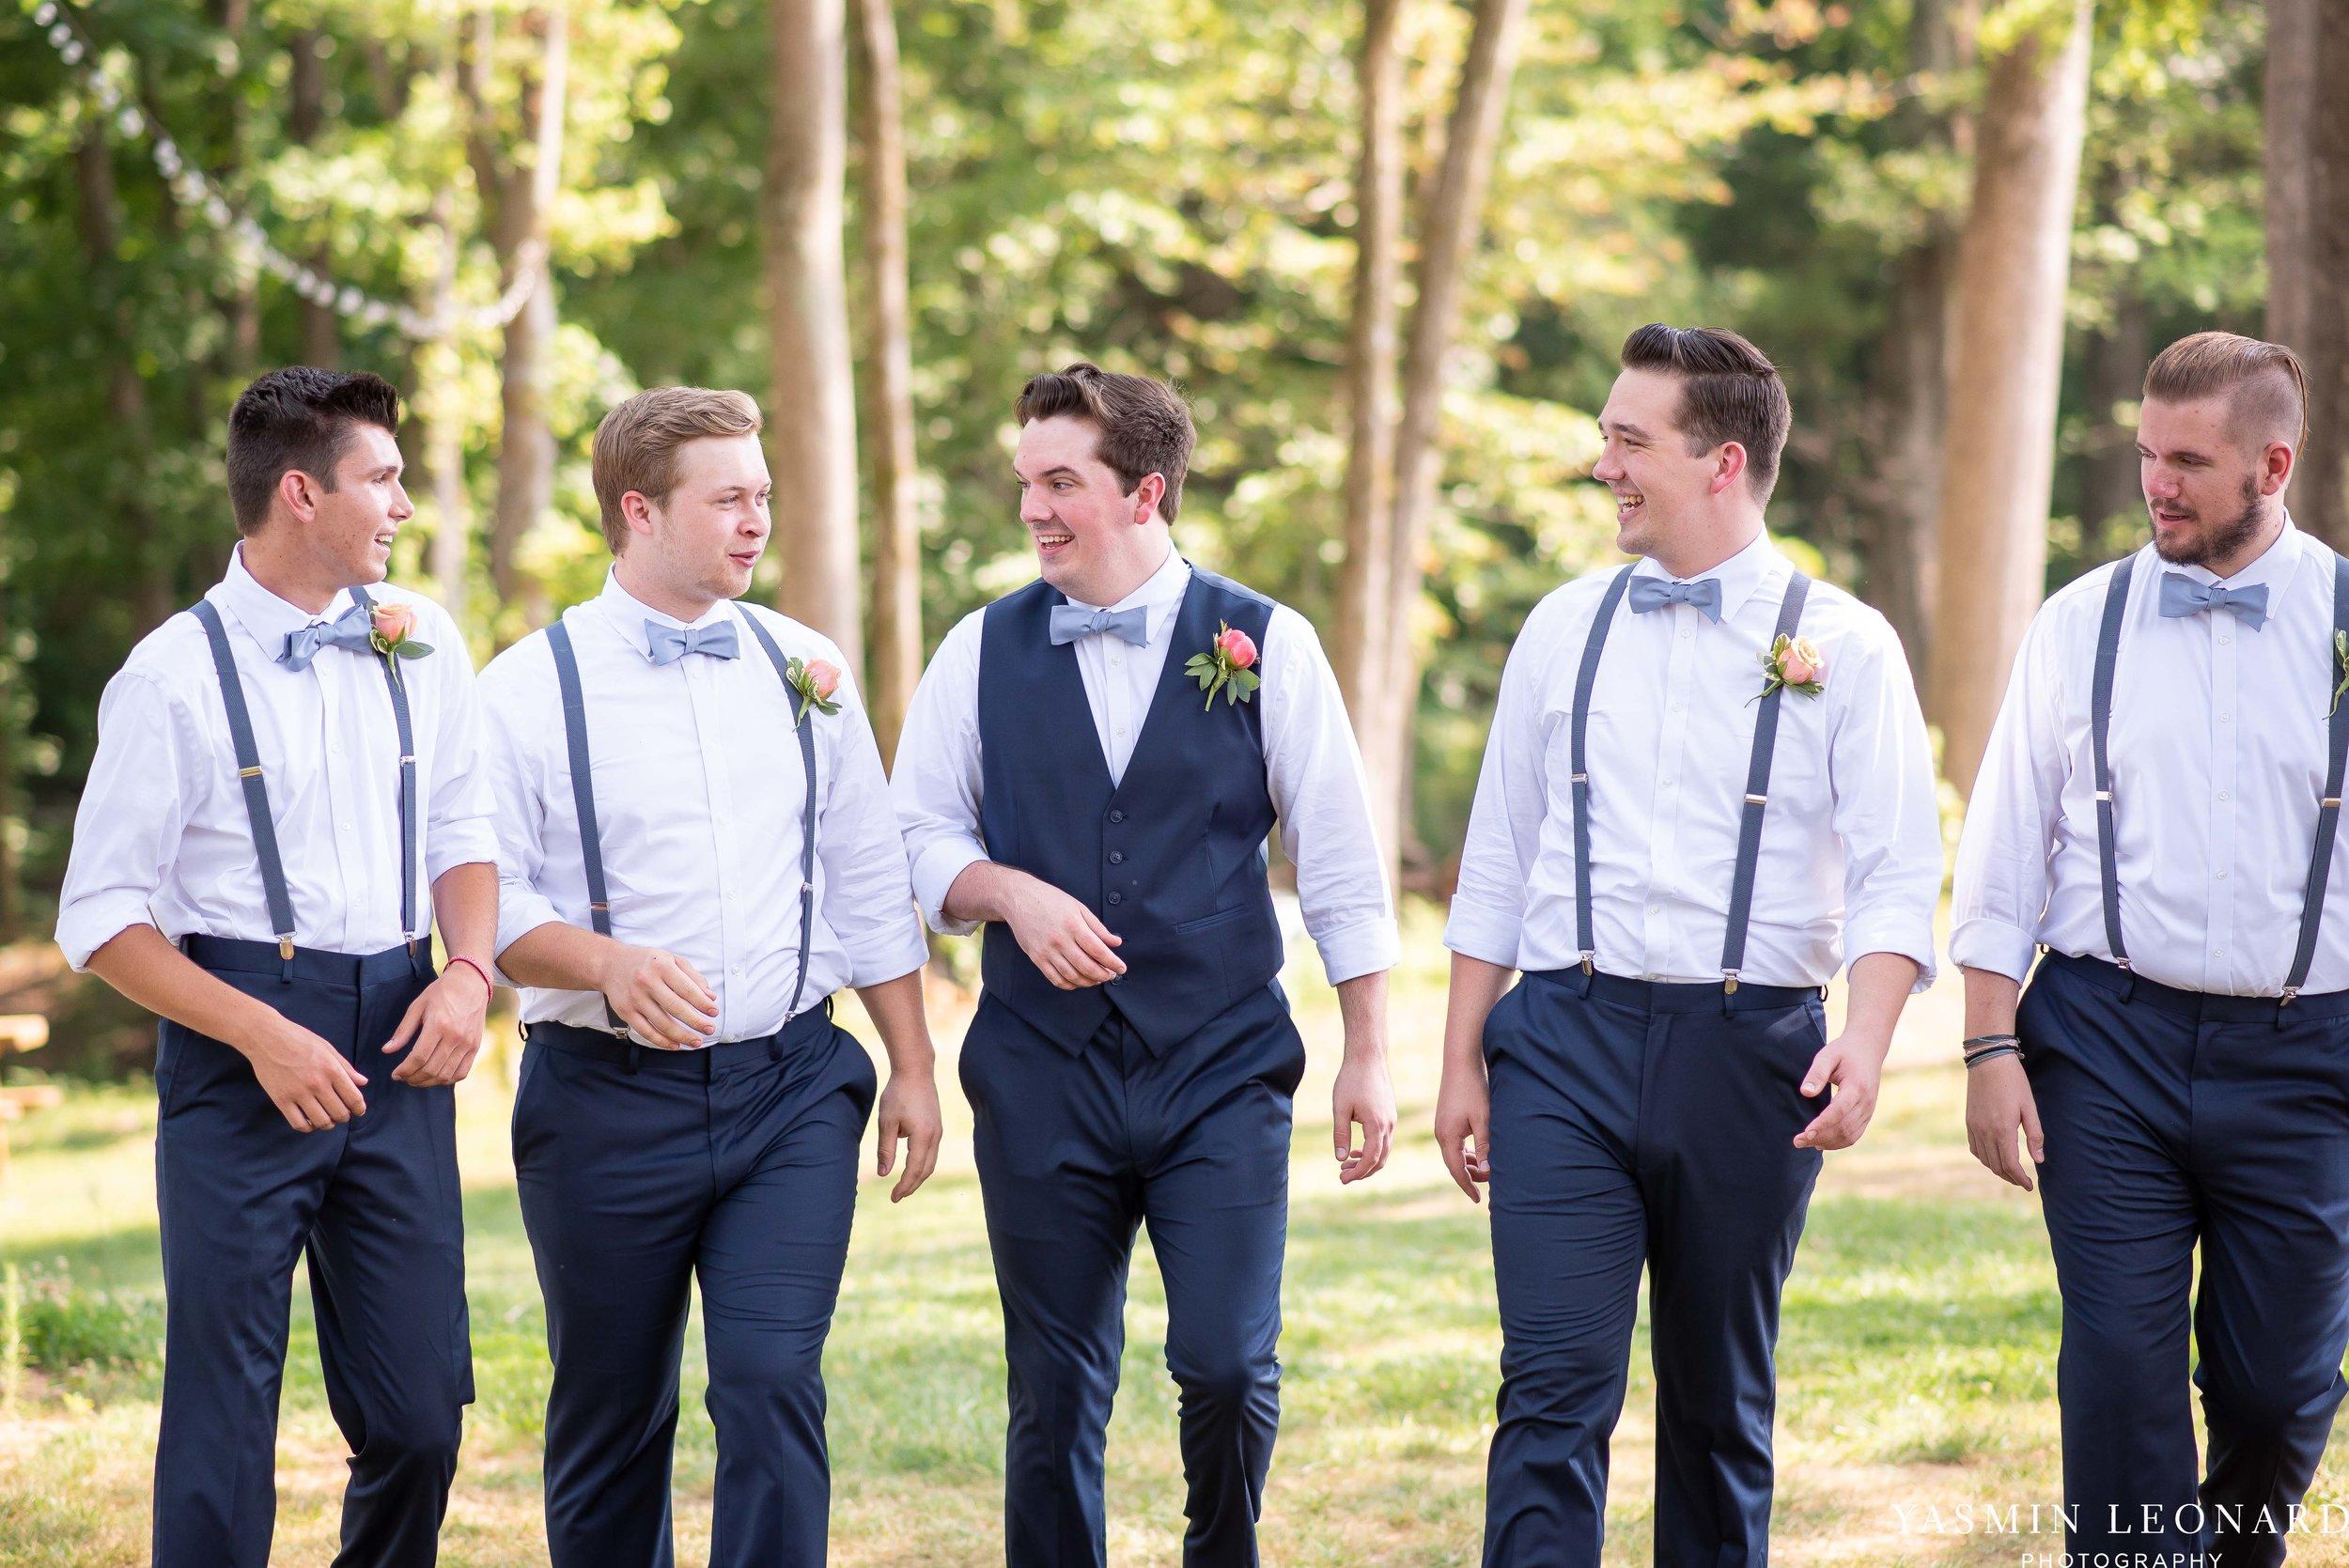 Old Homeplace Vineyard - NC Weddings - Outdoor Summer Weddings - Peony Boutique - Vineyard Wedding - NC Photographer - Yasmin Leonard Photography-20.jpg